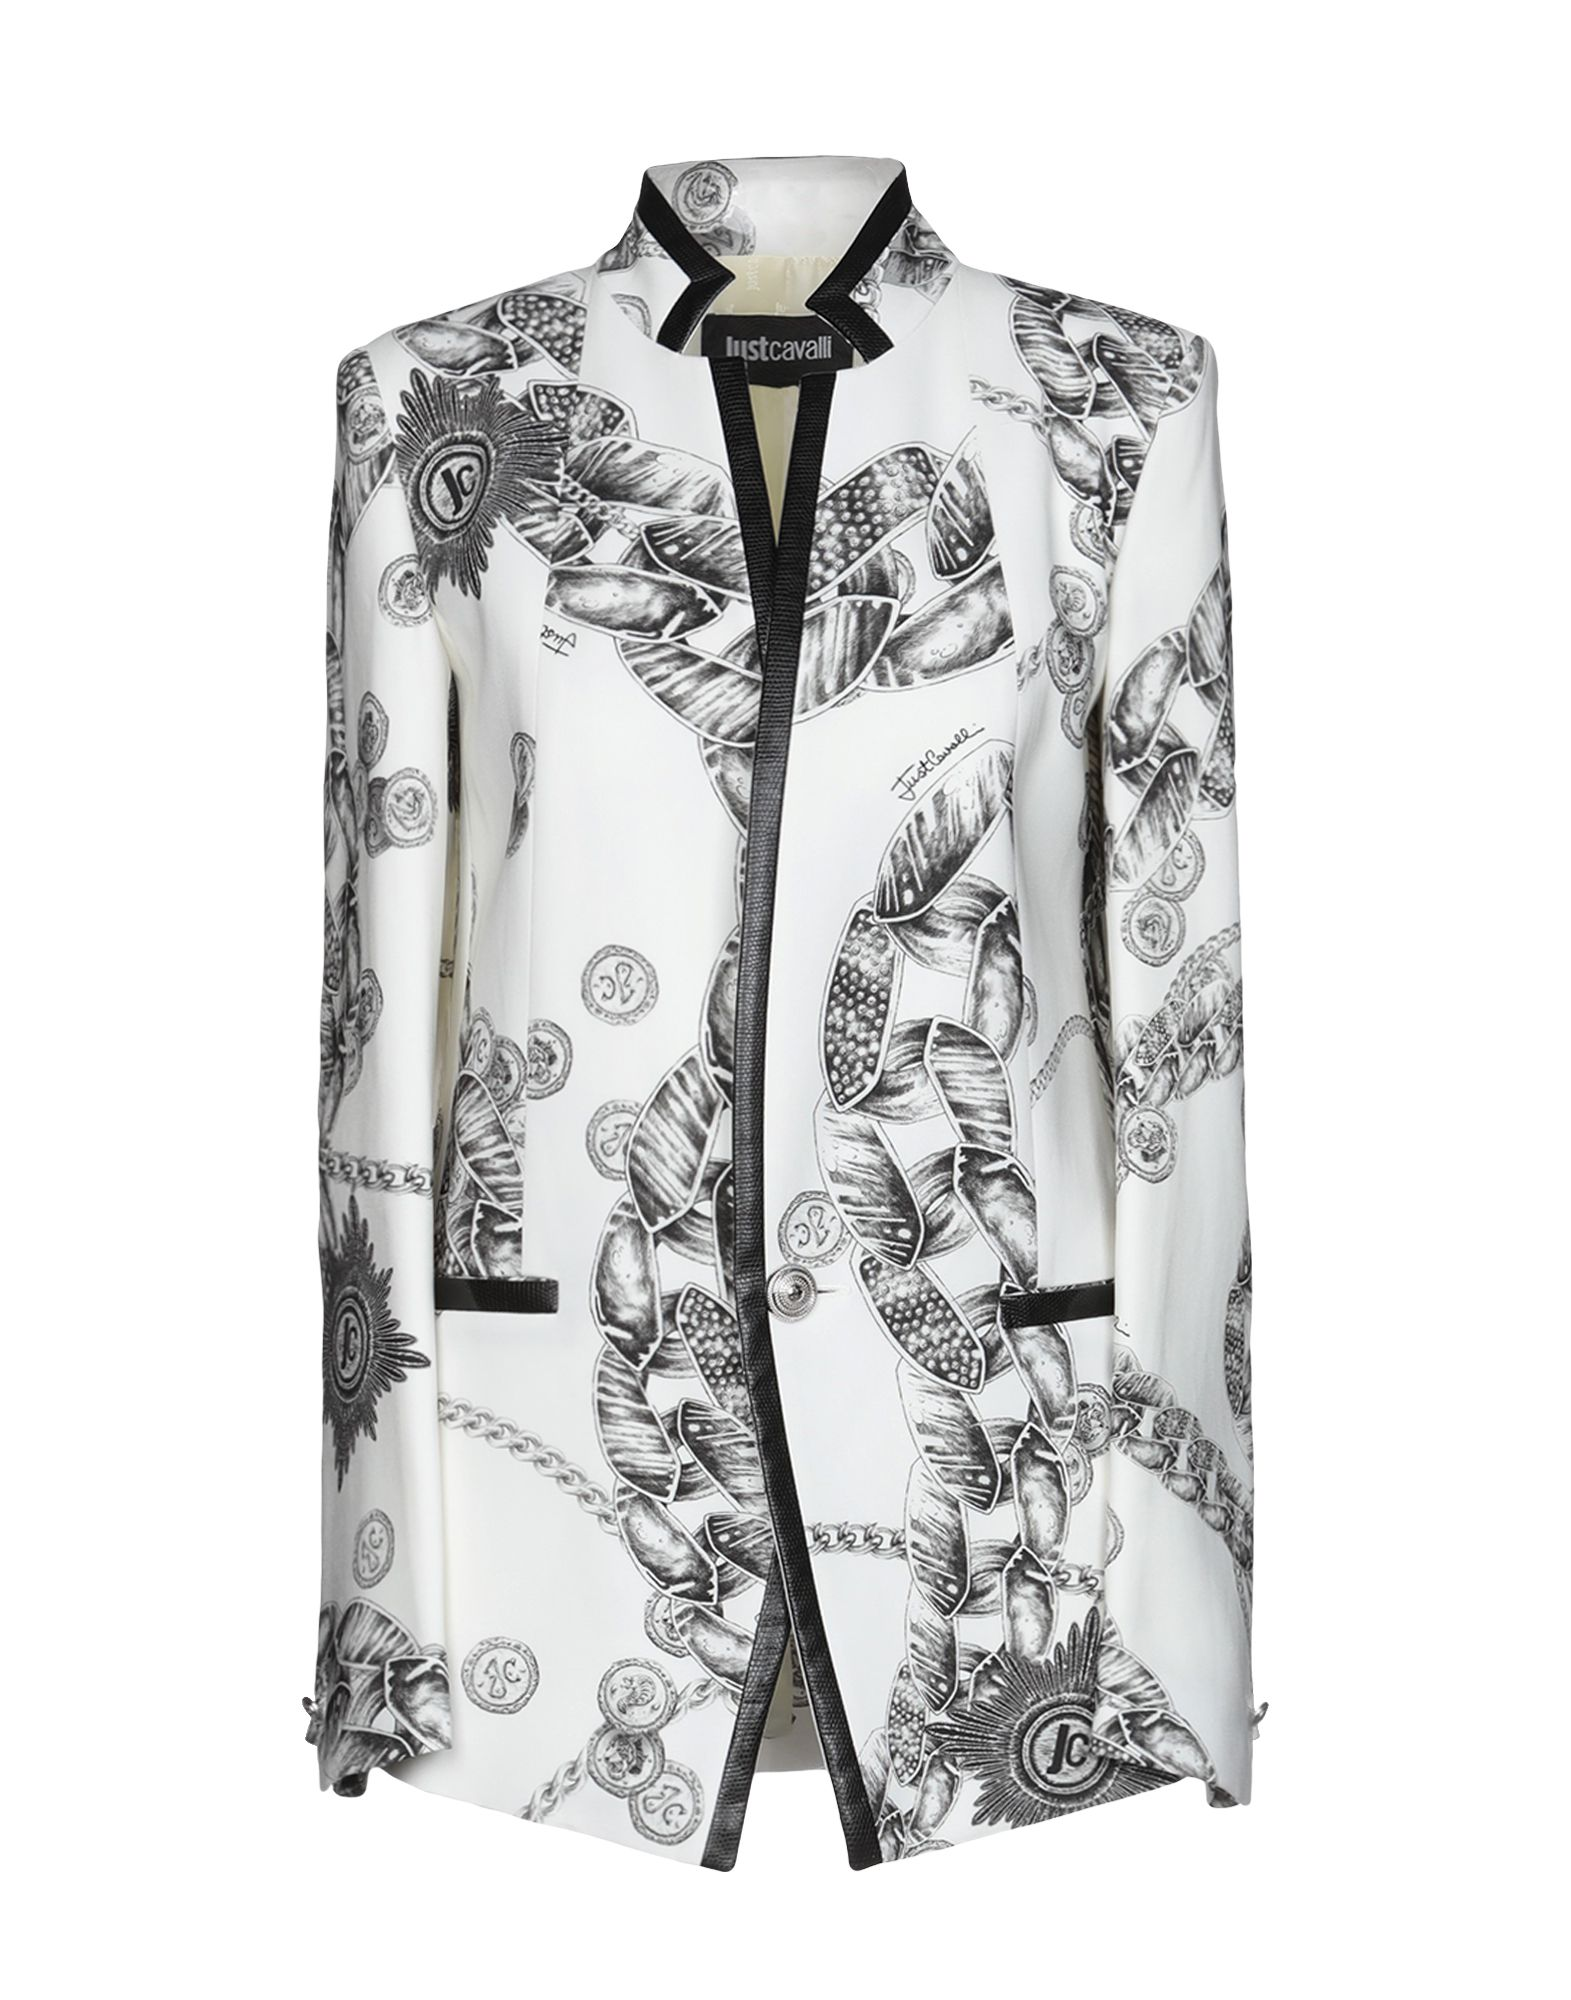 JUST CAVALLI Пиджак пиджак just cavalli пиджак